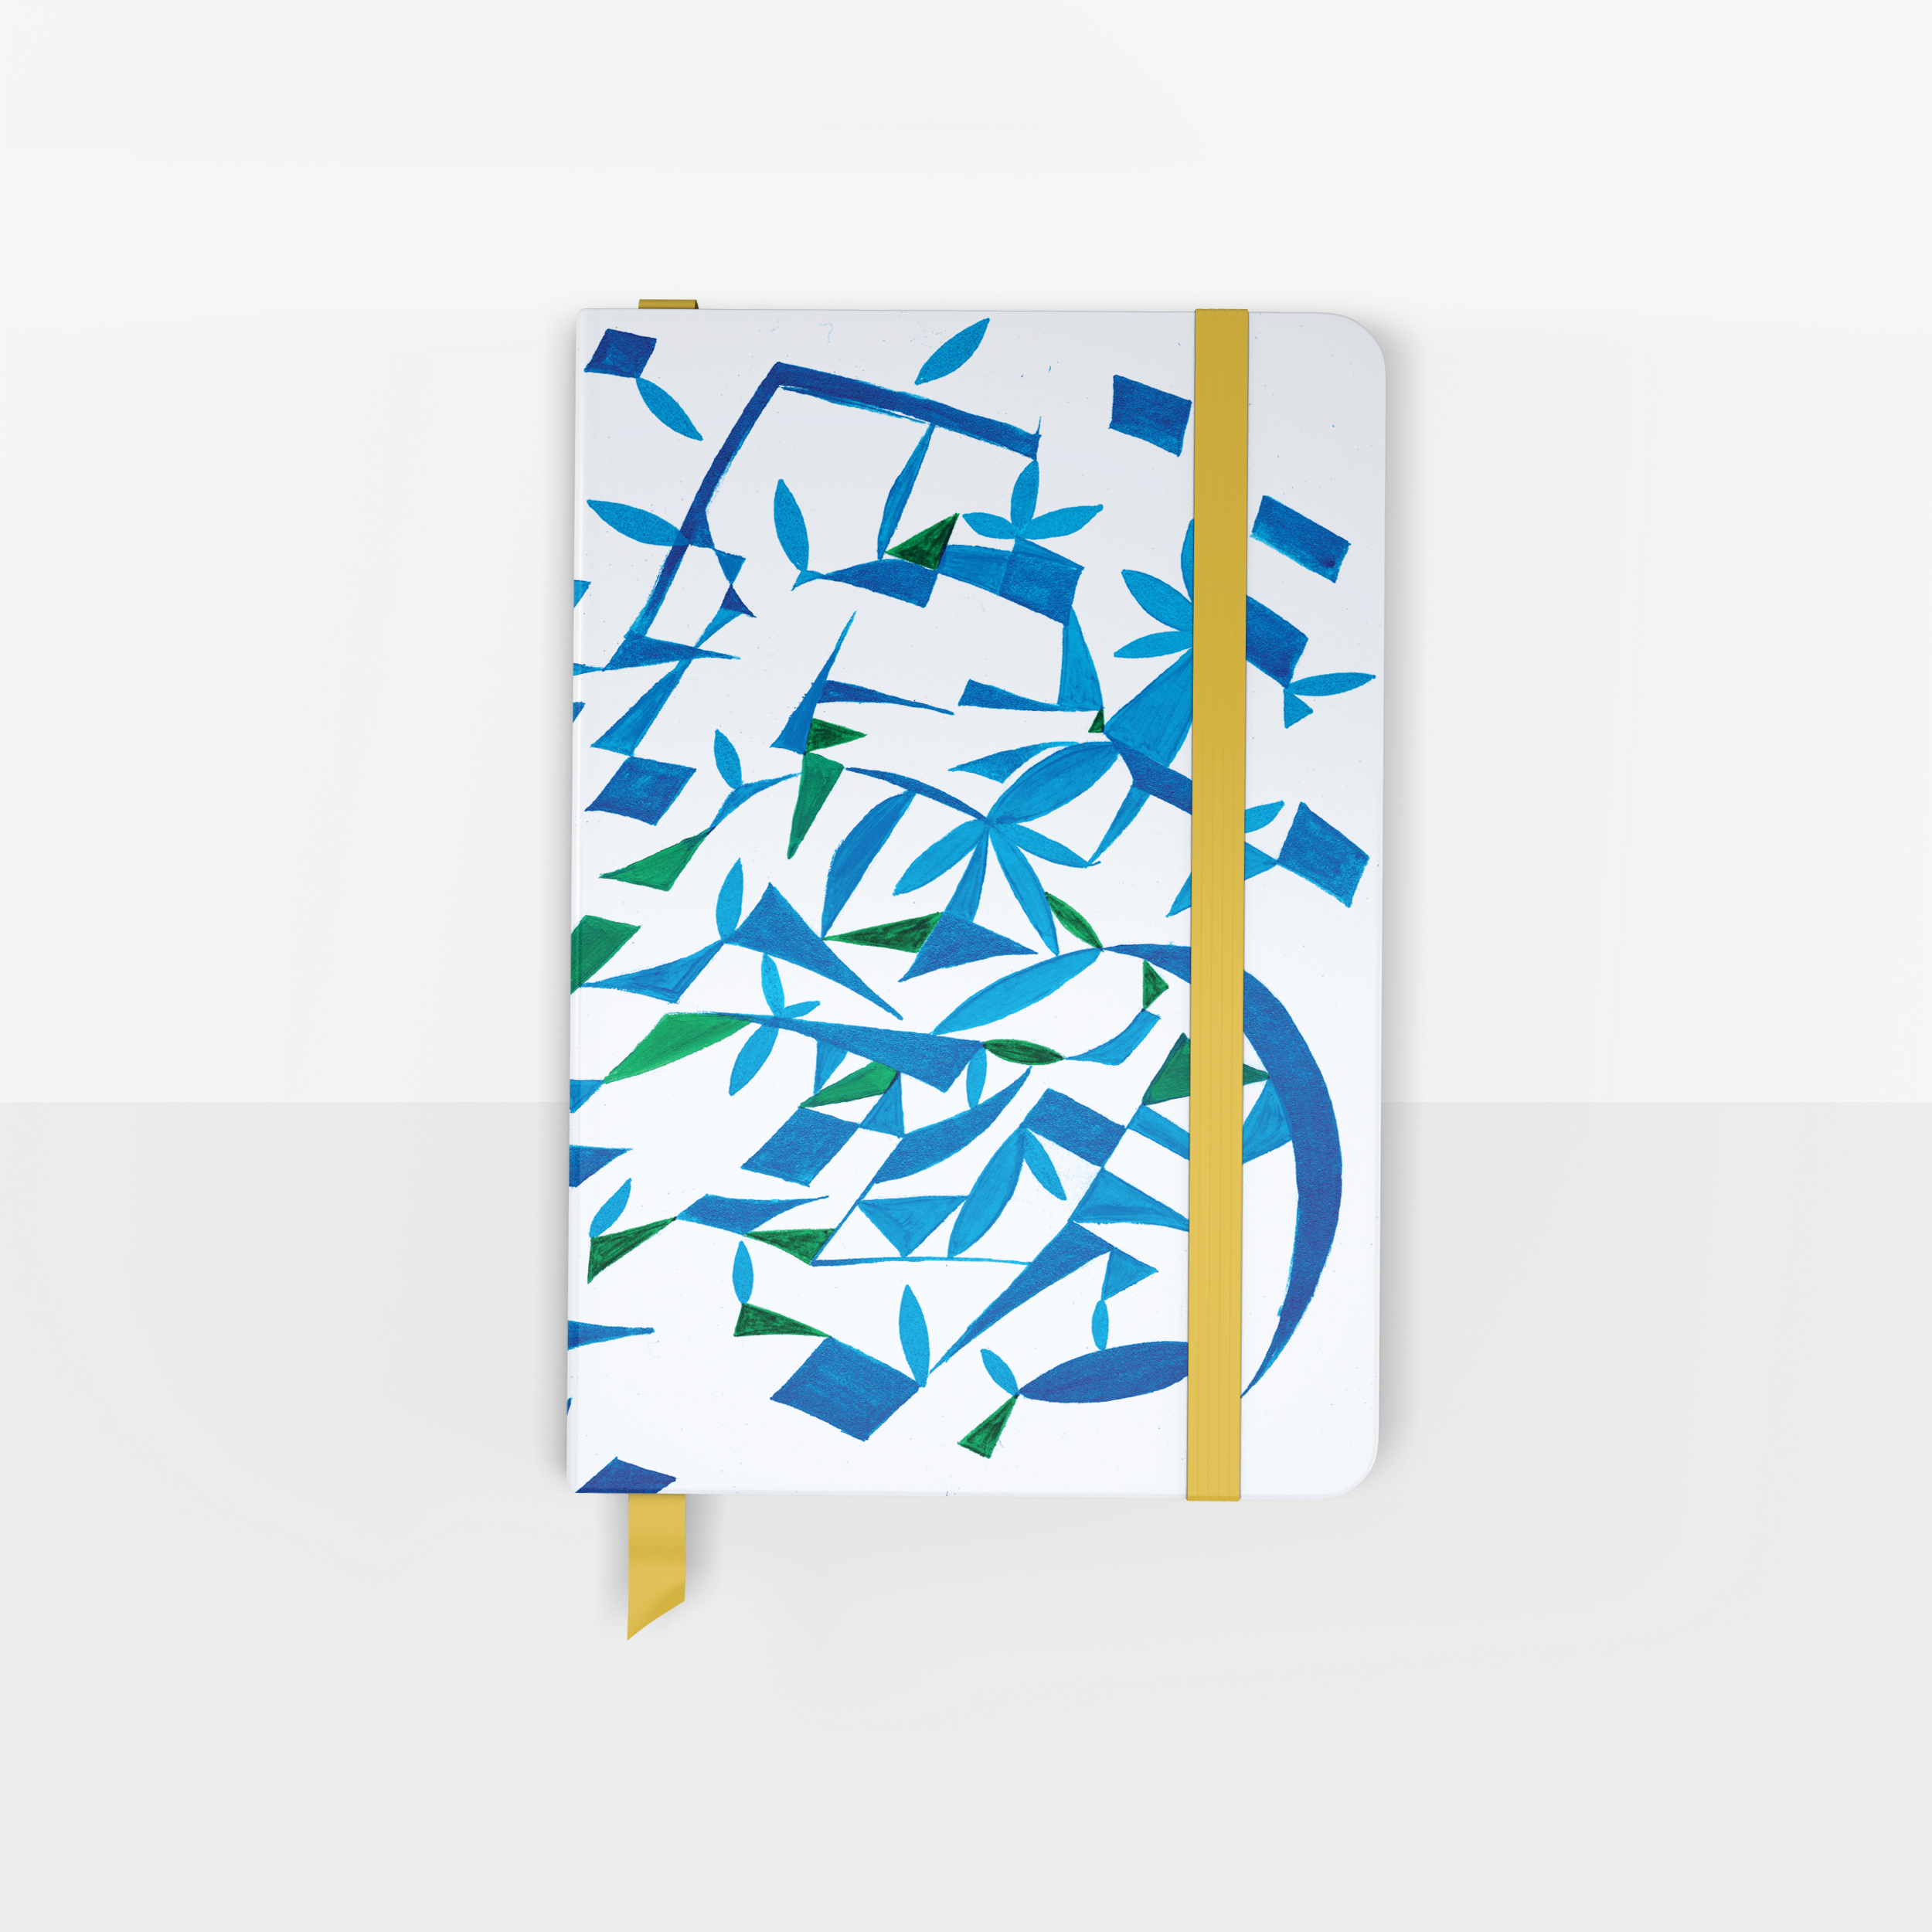 blue flowers in love - CODIGO:PRECIO REGULAR: